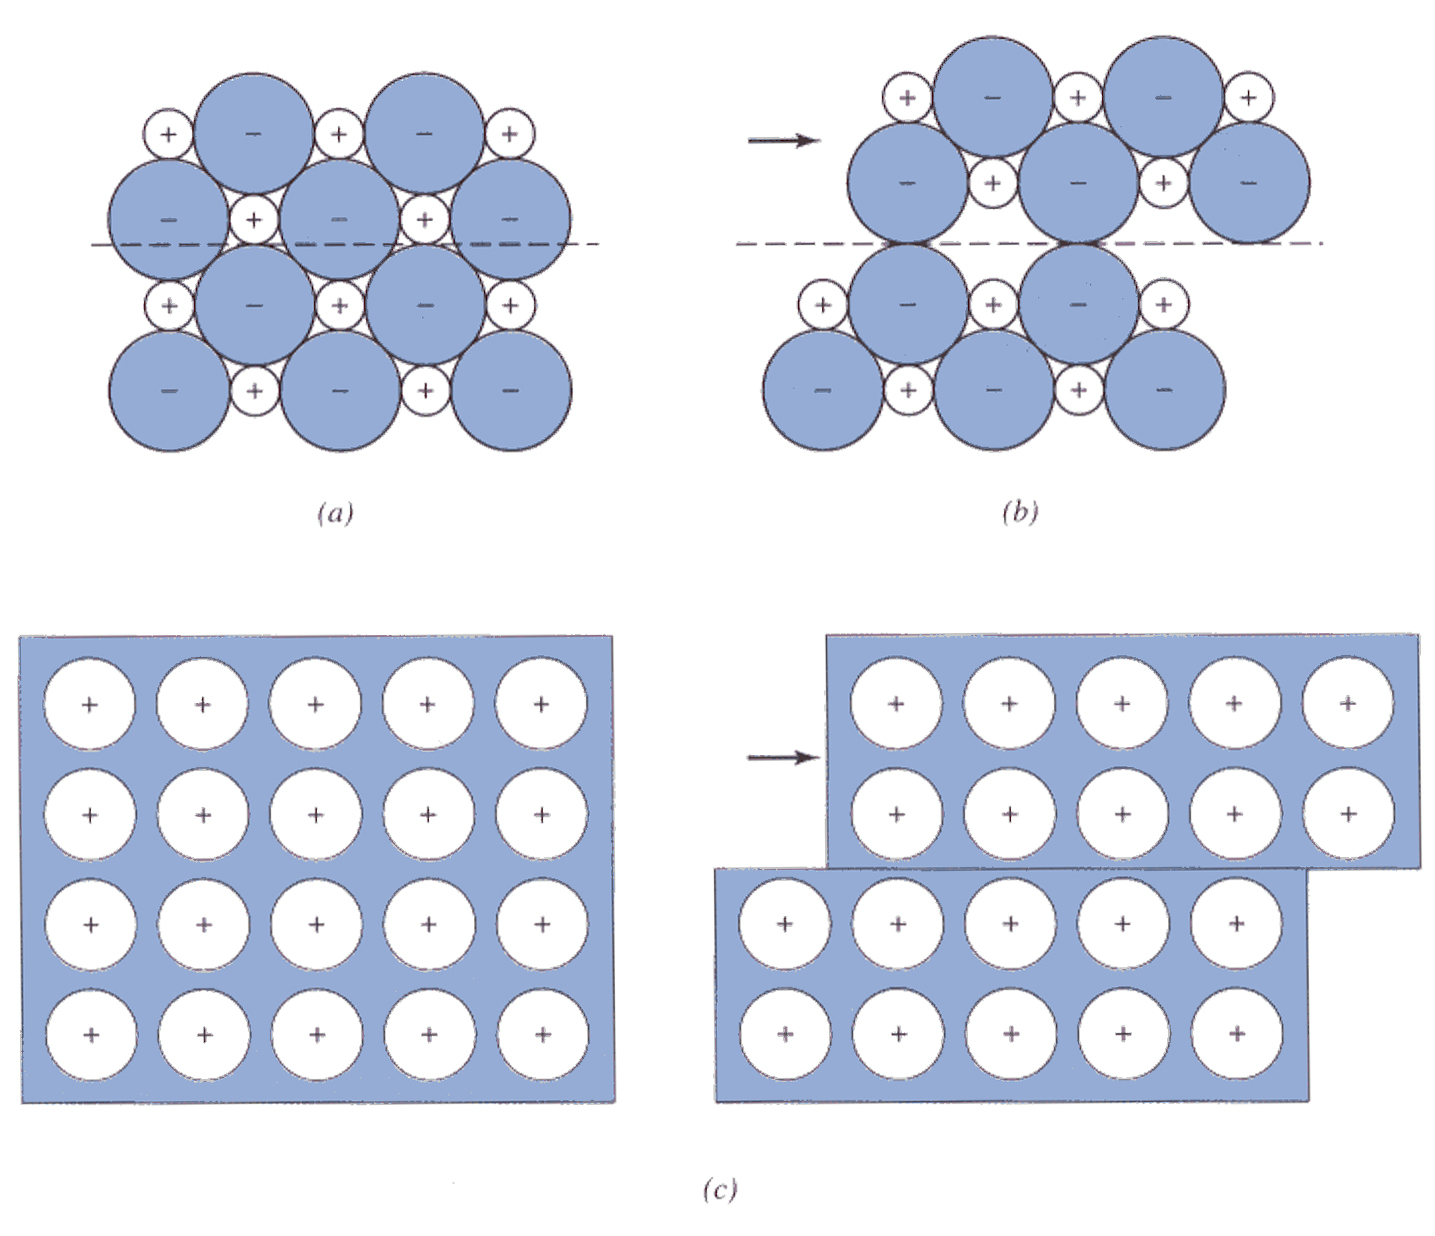 atomic diagram of tin diagram of interior of 2002 dodge caravan #15